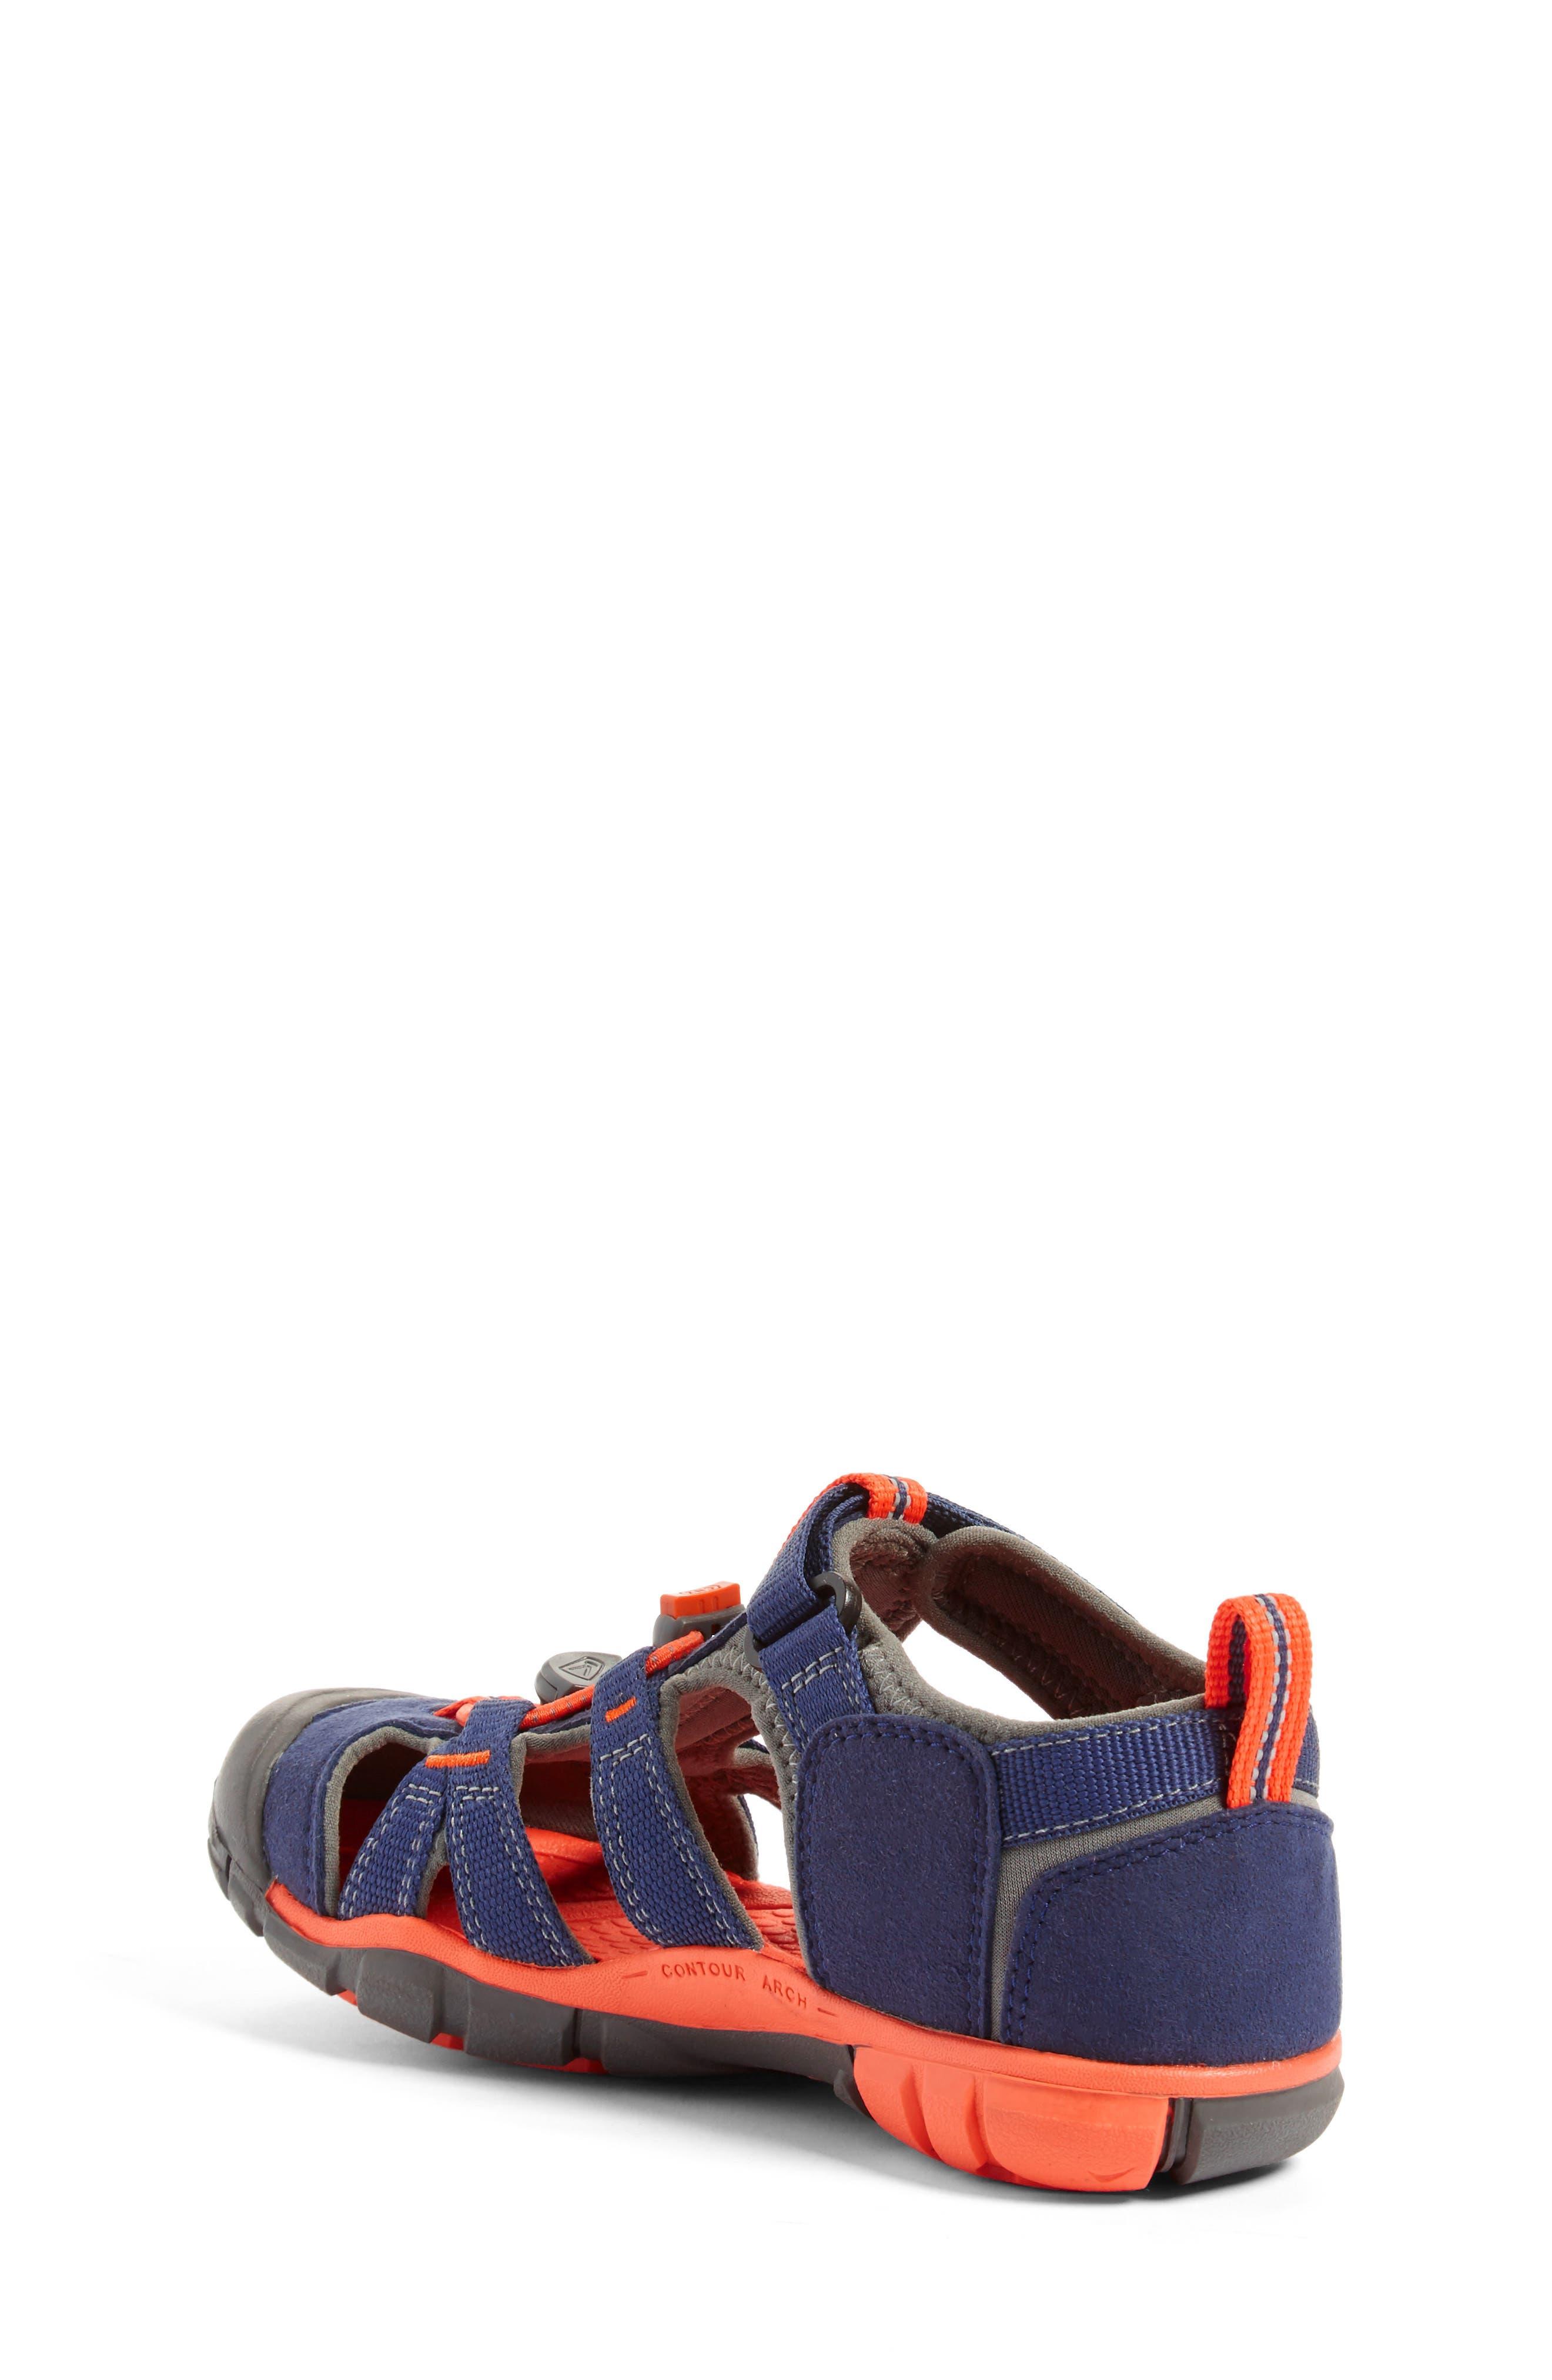 ,                             'Seacamp II' Water Friendly Sandal,                             Alternate thumbnail 156, color,                             402